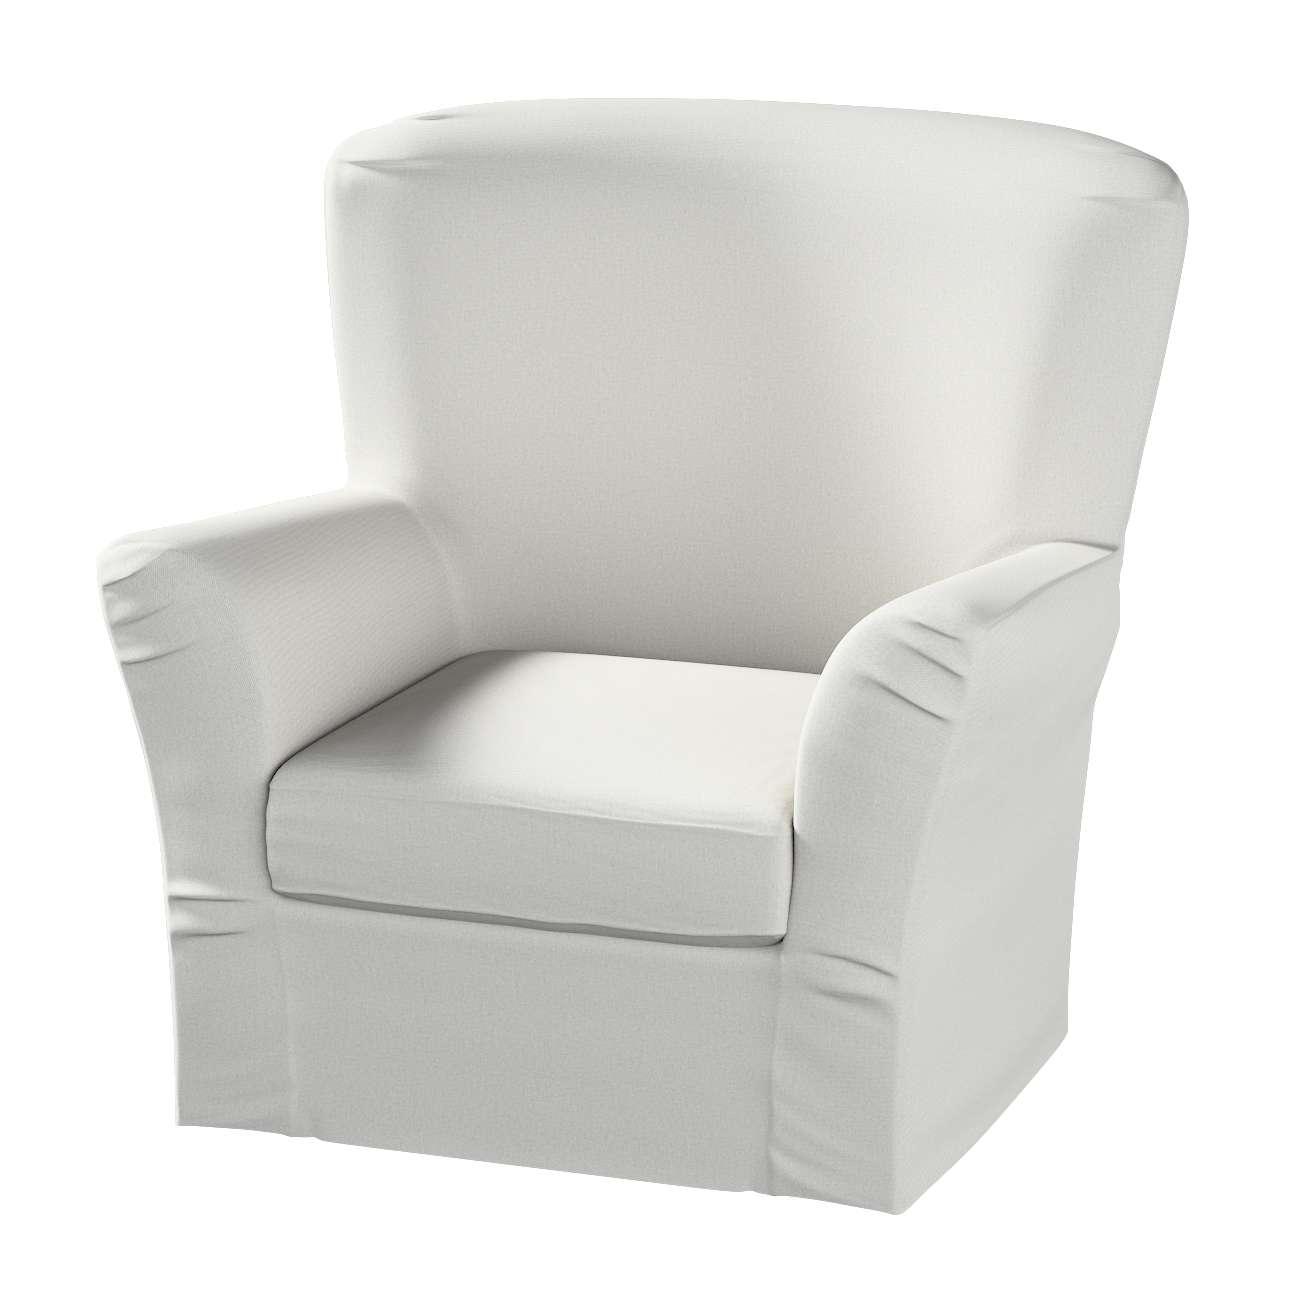 TOMELILLA fotelio užvalkalas TOMELILLA fotelis kolekcijoje Etna , audinys: 705-90